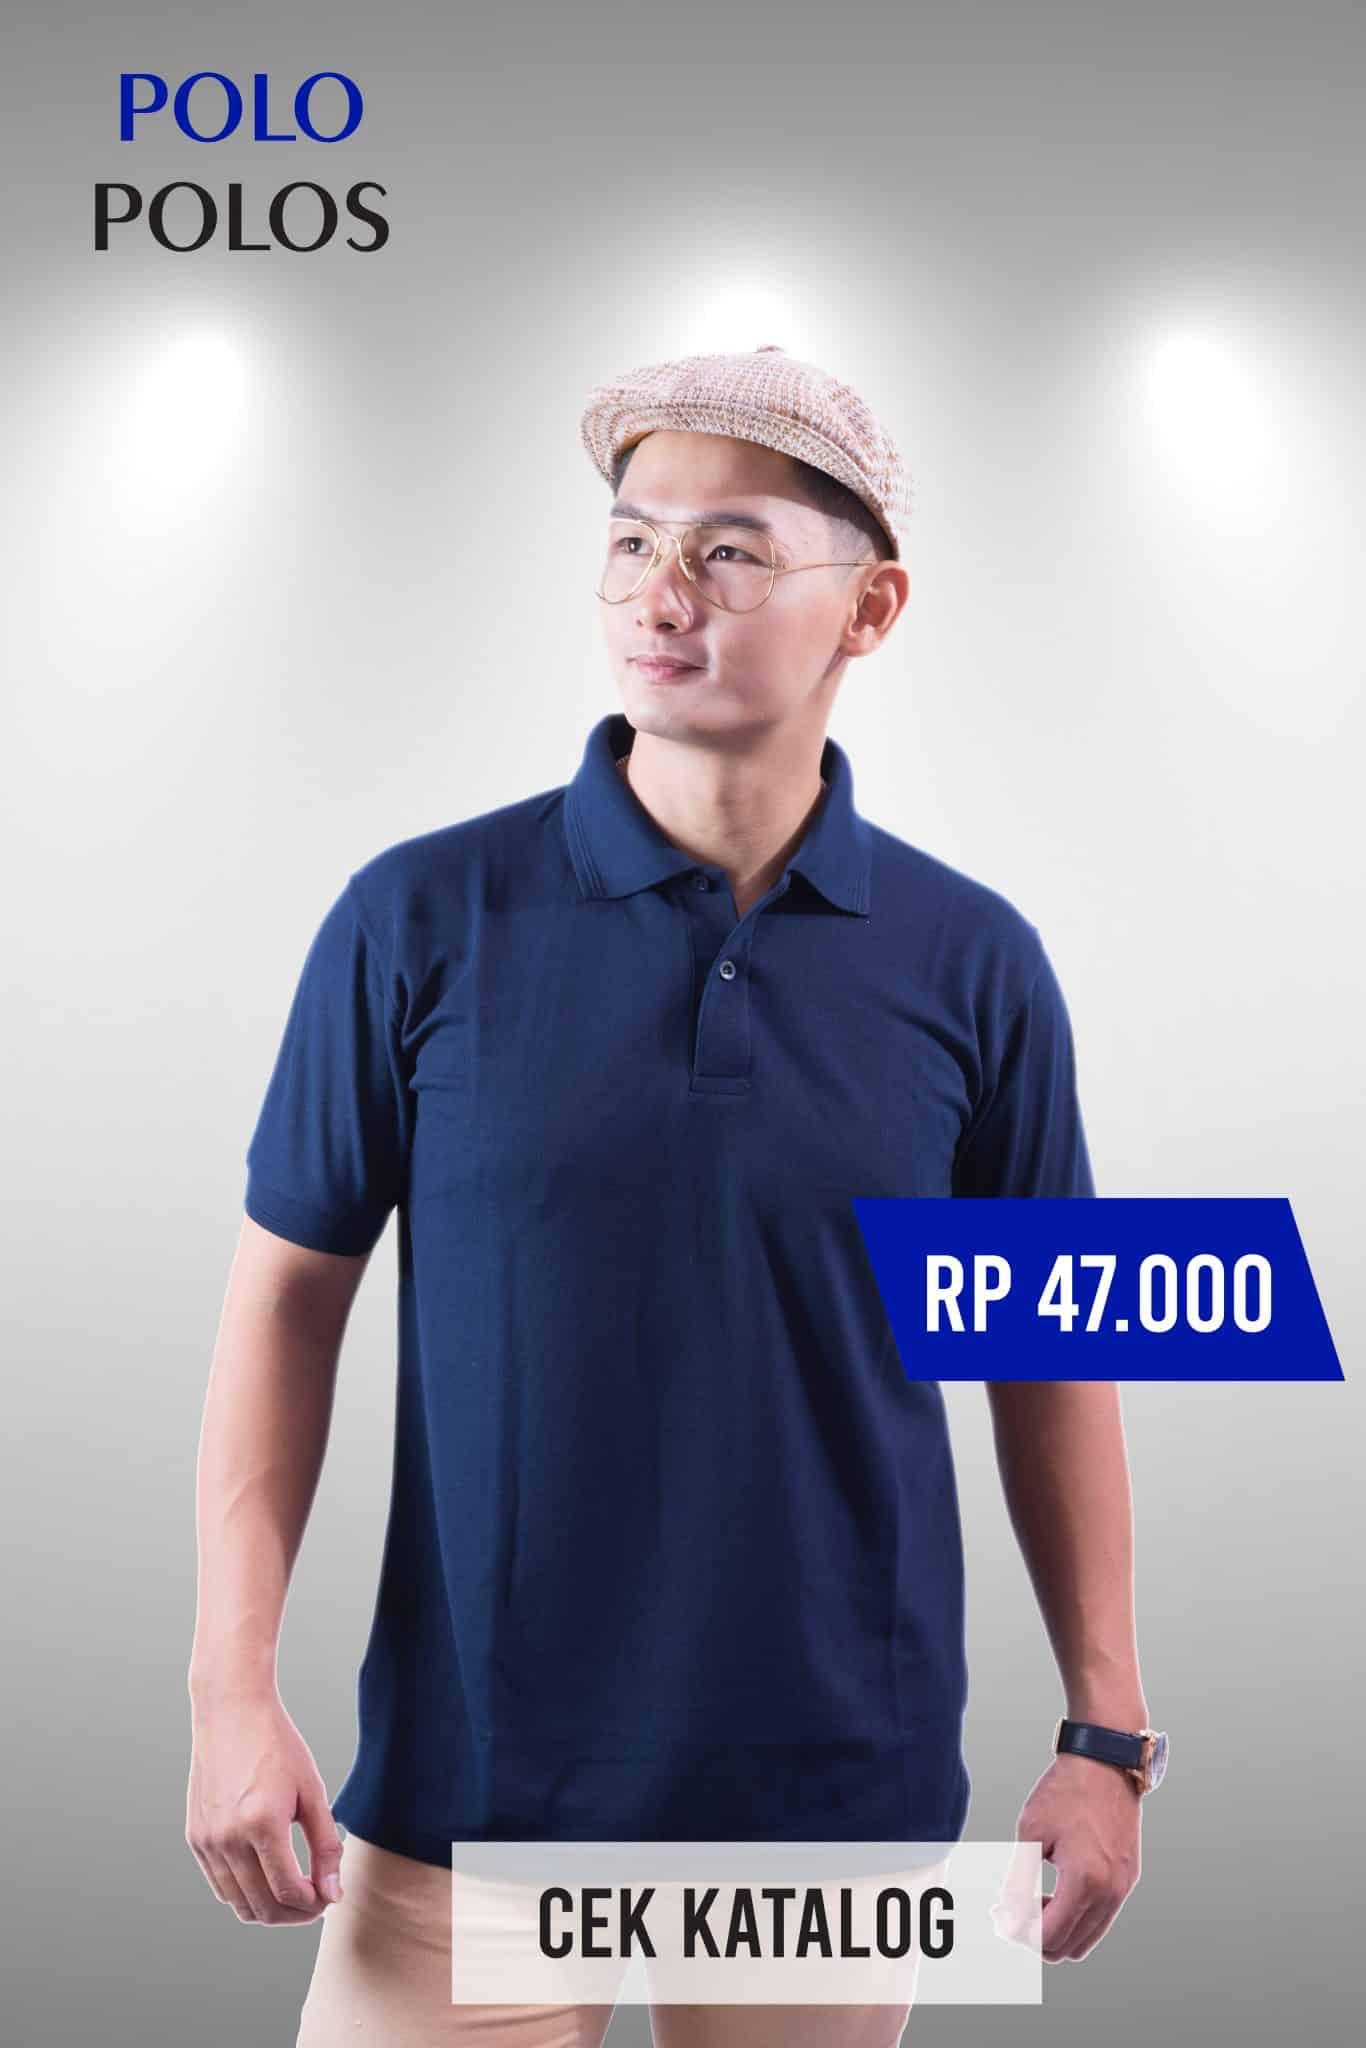 Kaos Polo Jogja Murah - Grosir Polo Jogja - Polo Polos - Ozzy Clothing